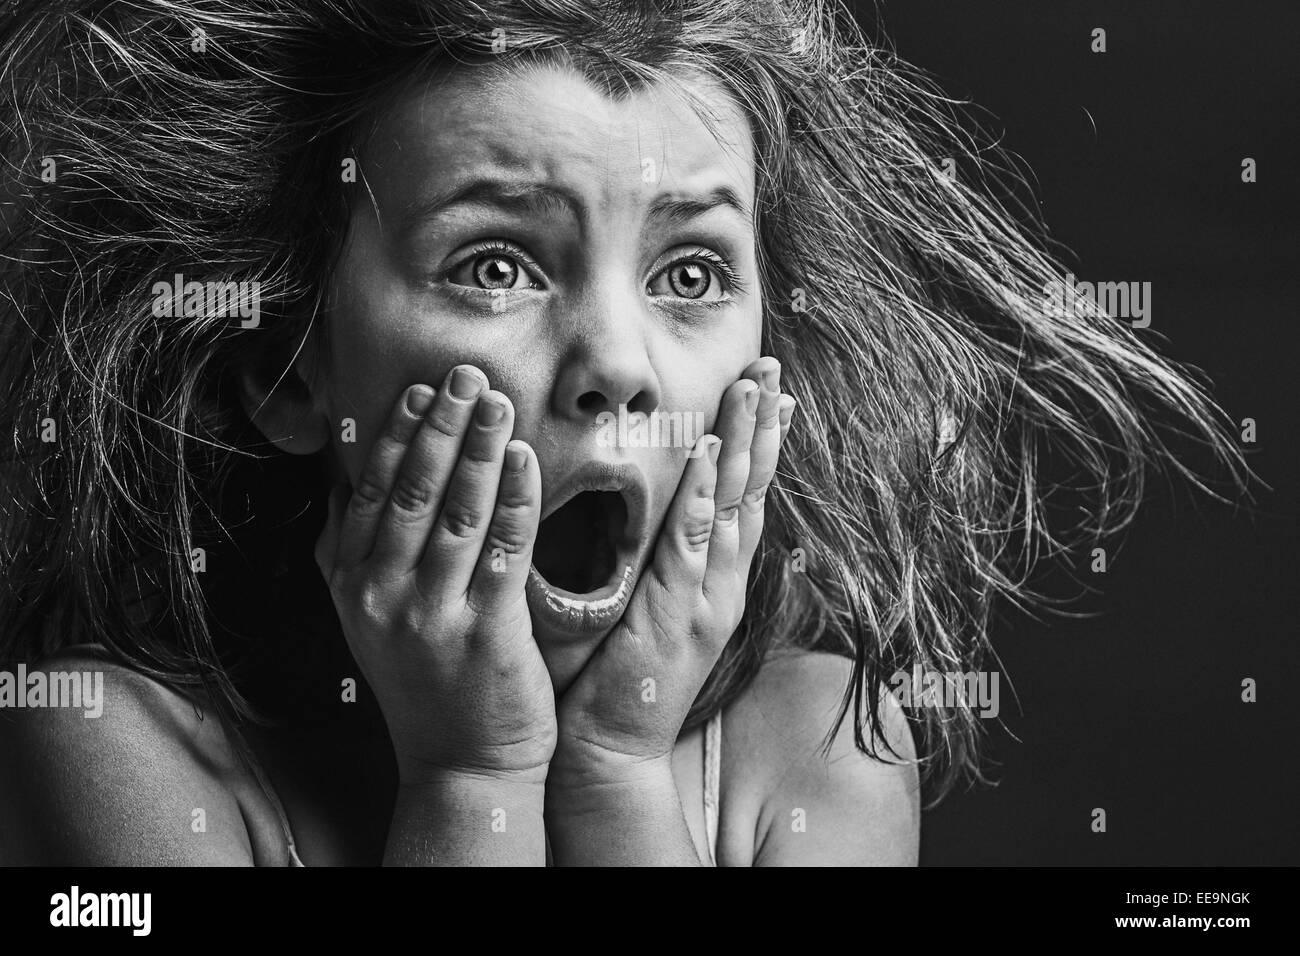 Imagen poderosa de miedo niño Imagen De Stock